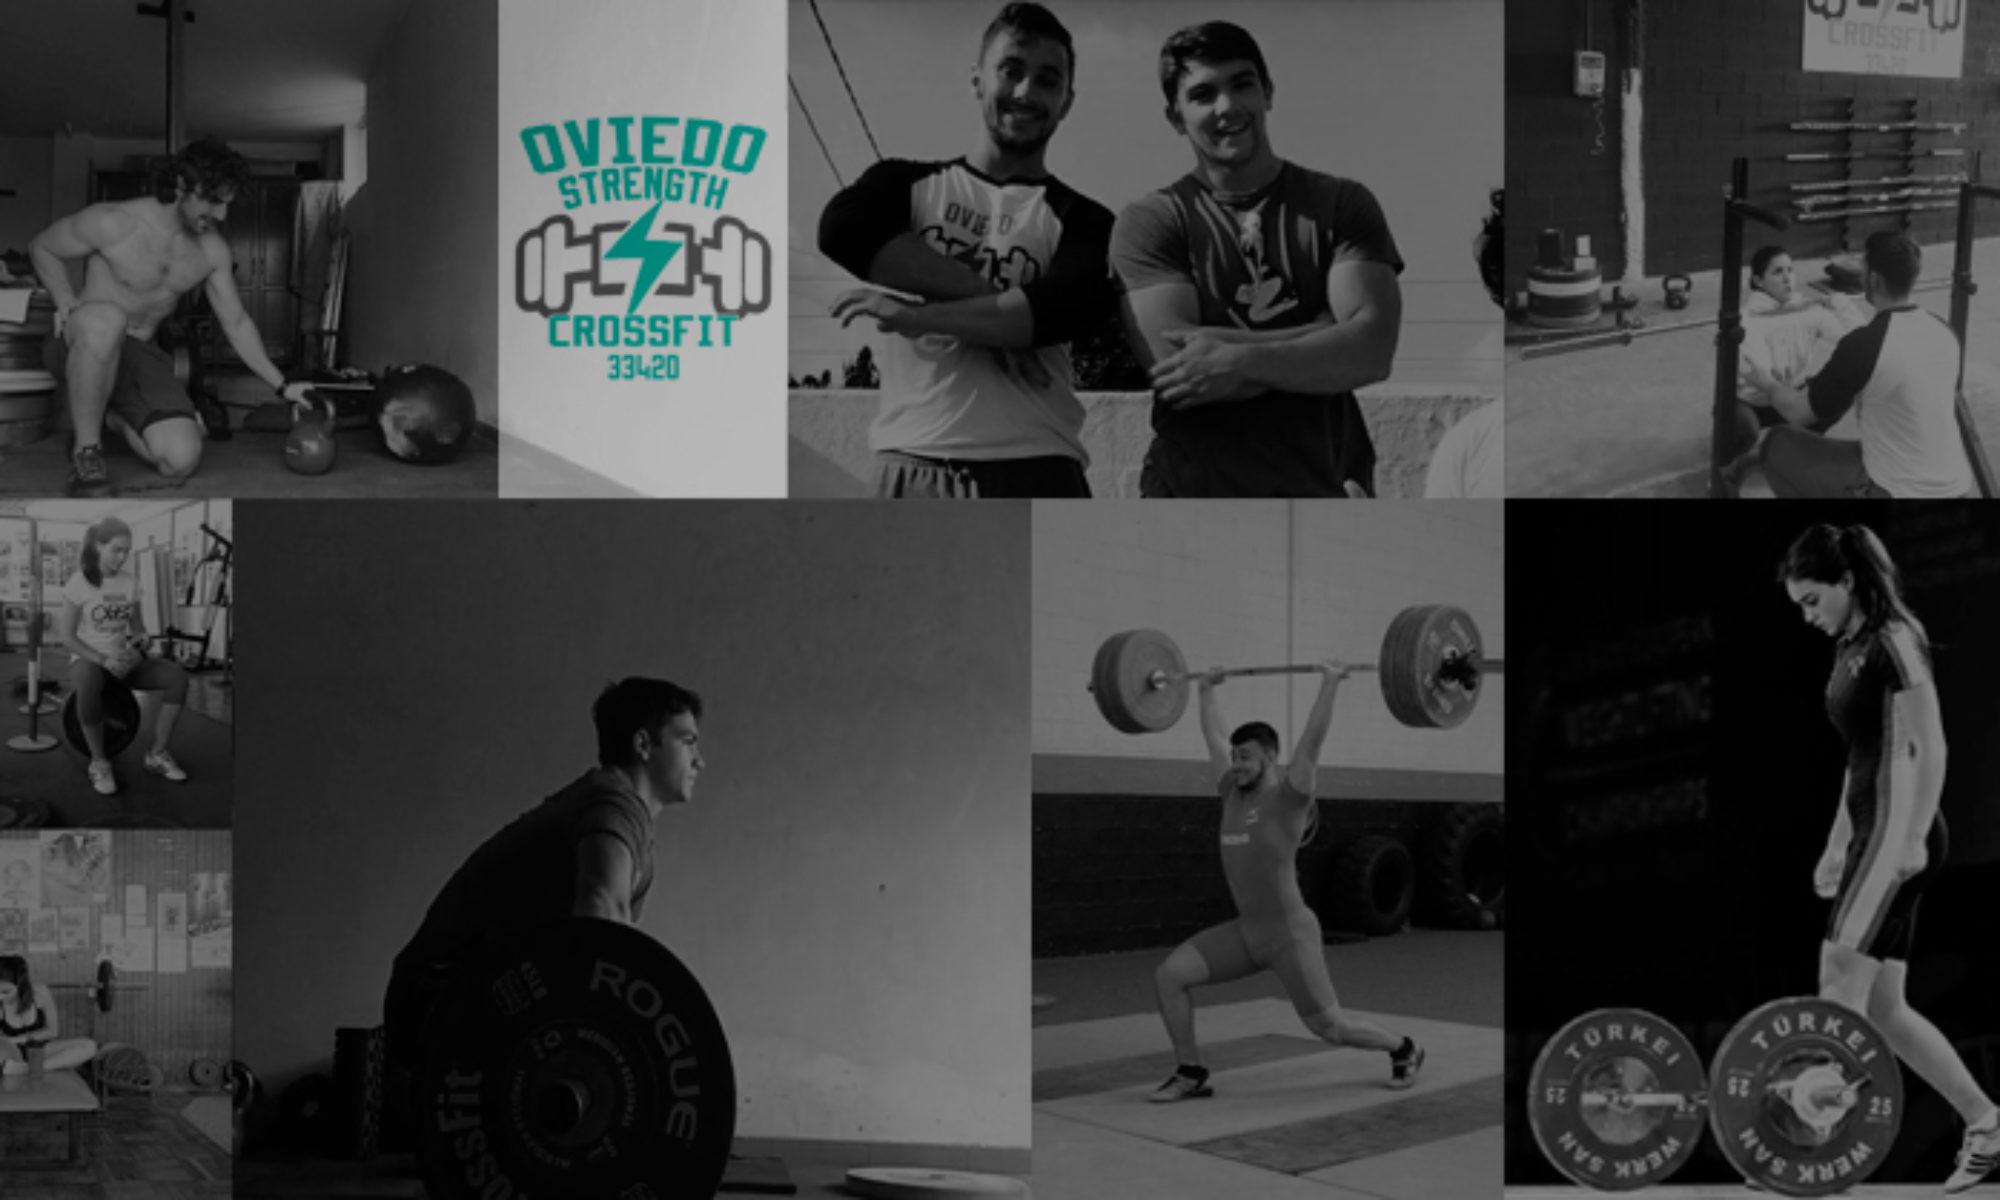 Oviedo Strength - Blog